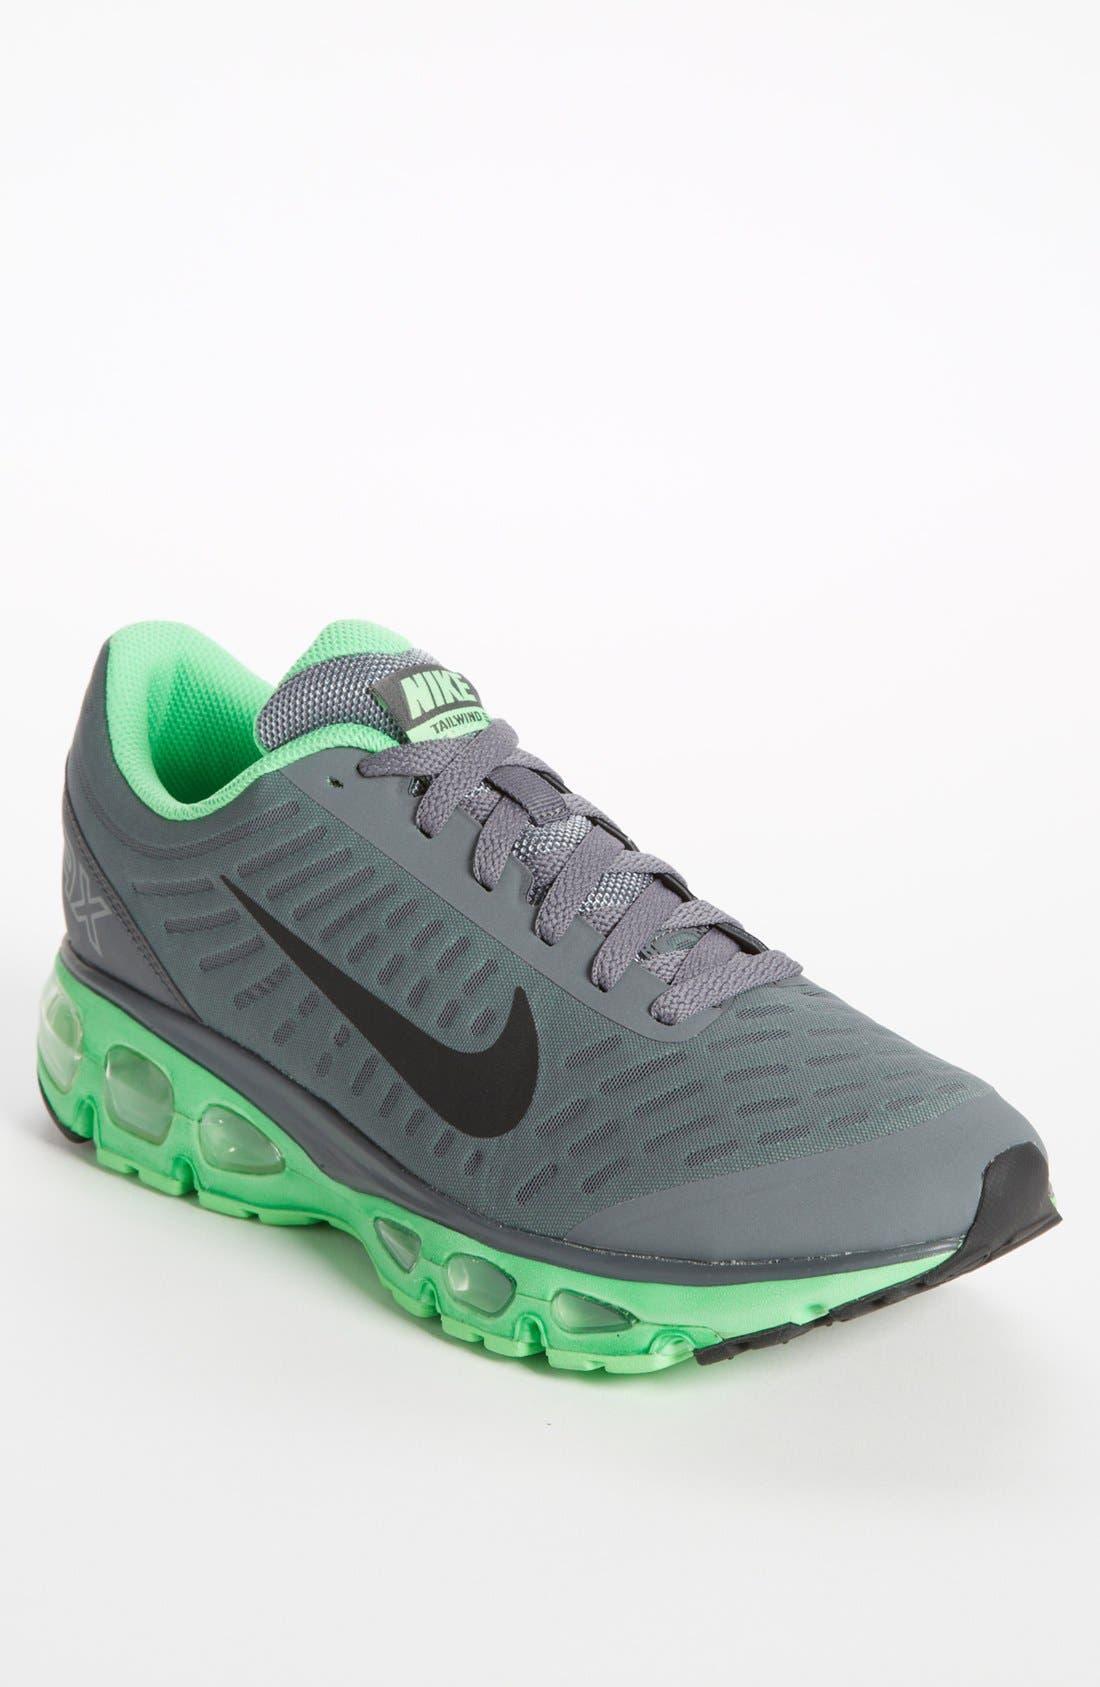 Alternate Image 1 Selected - Nike 'Air Max Tailwind+ 5' Running Shoe (Men)